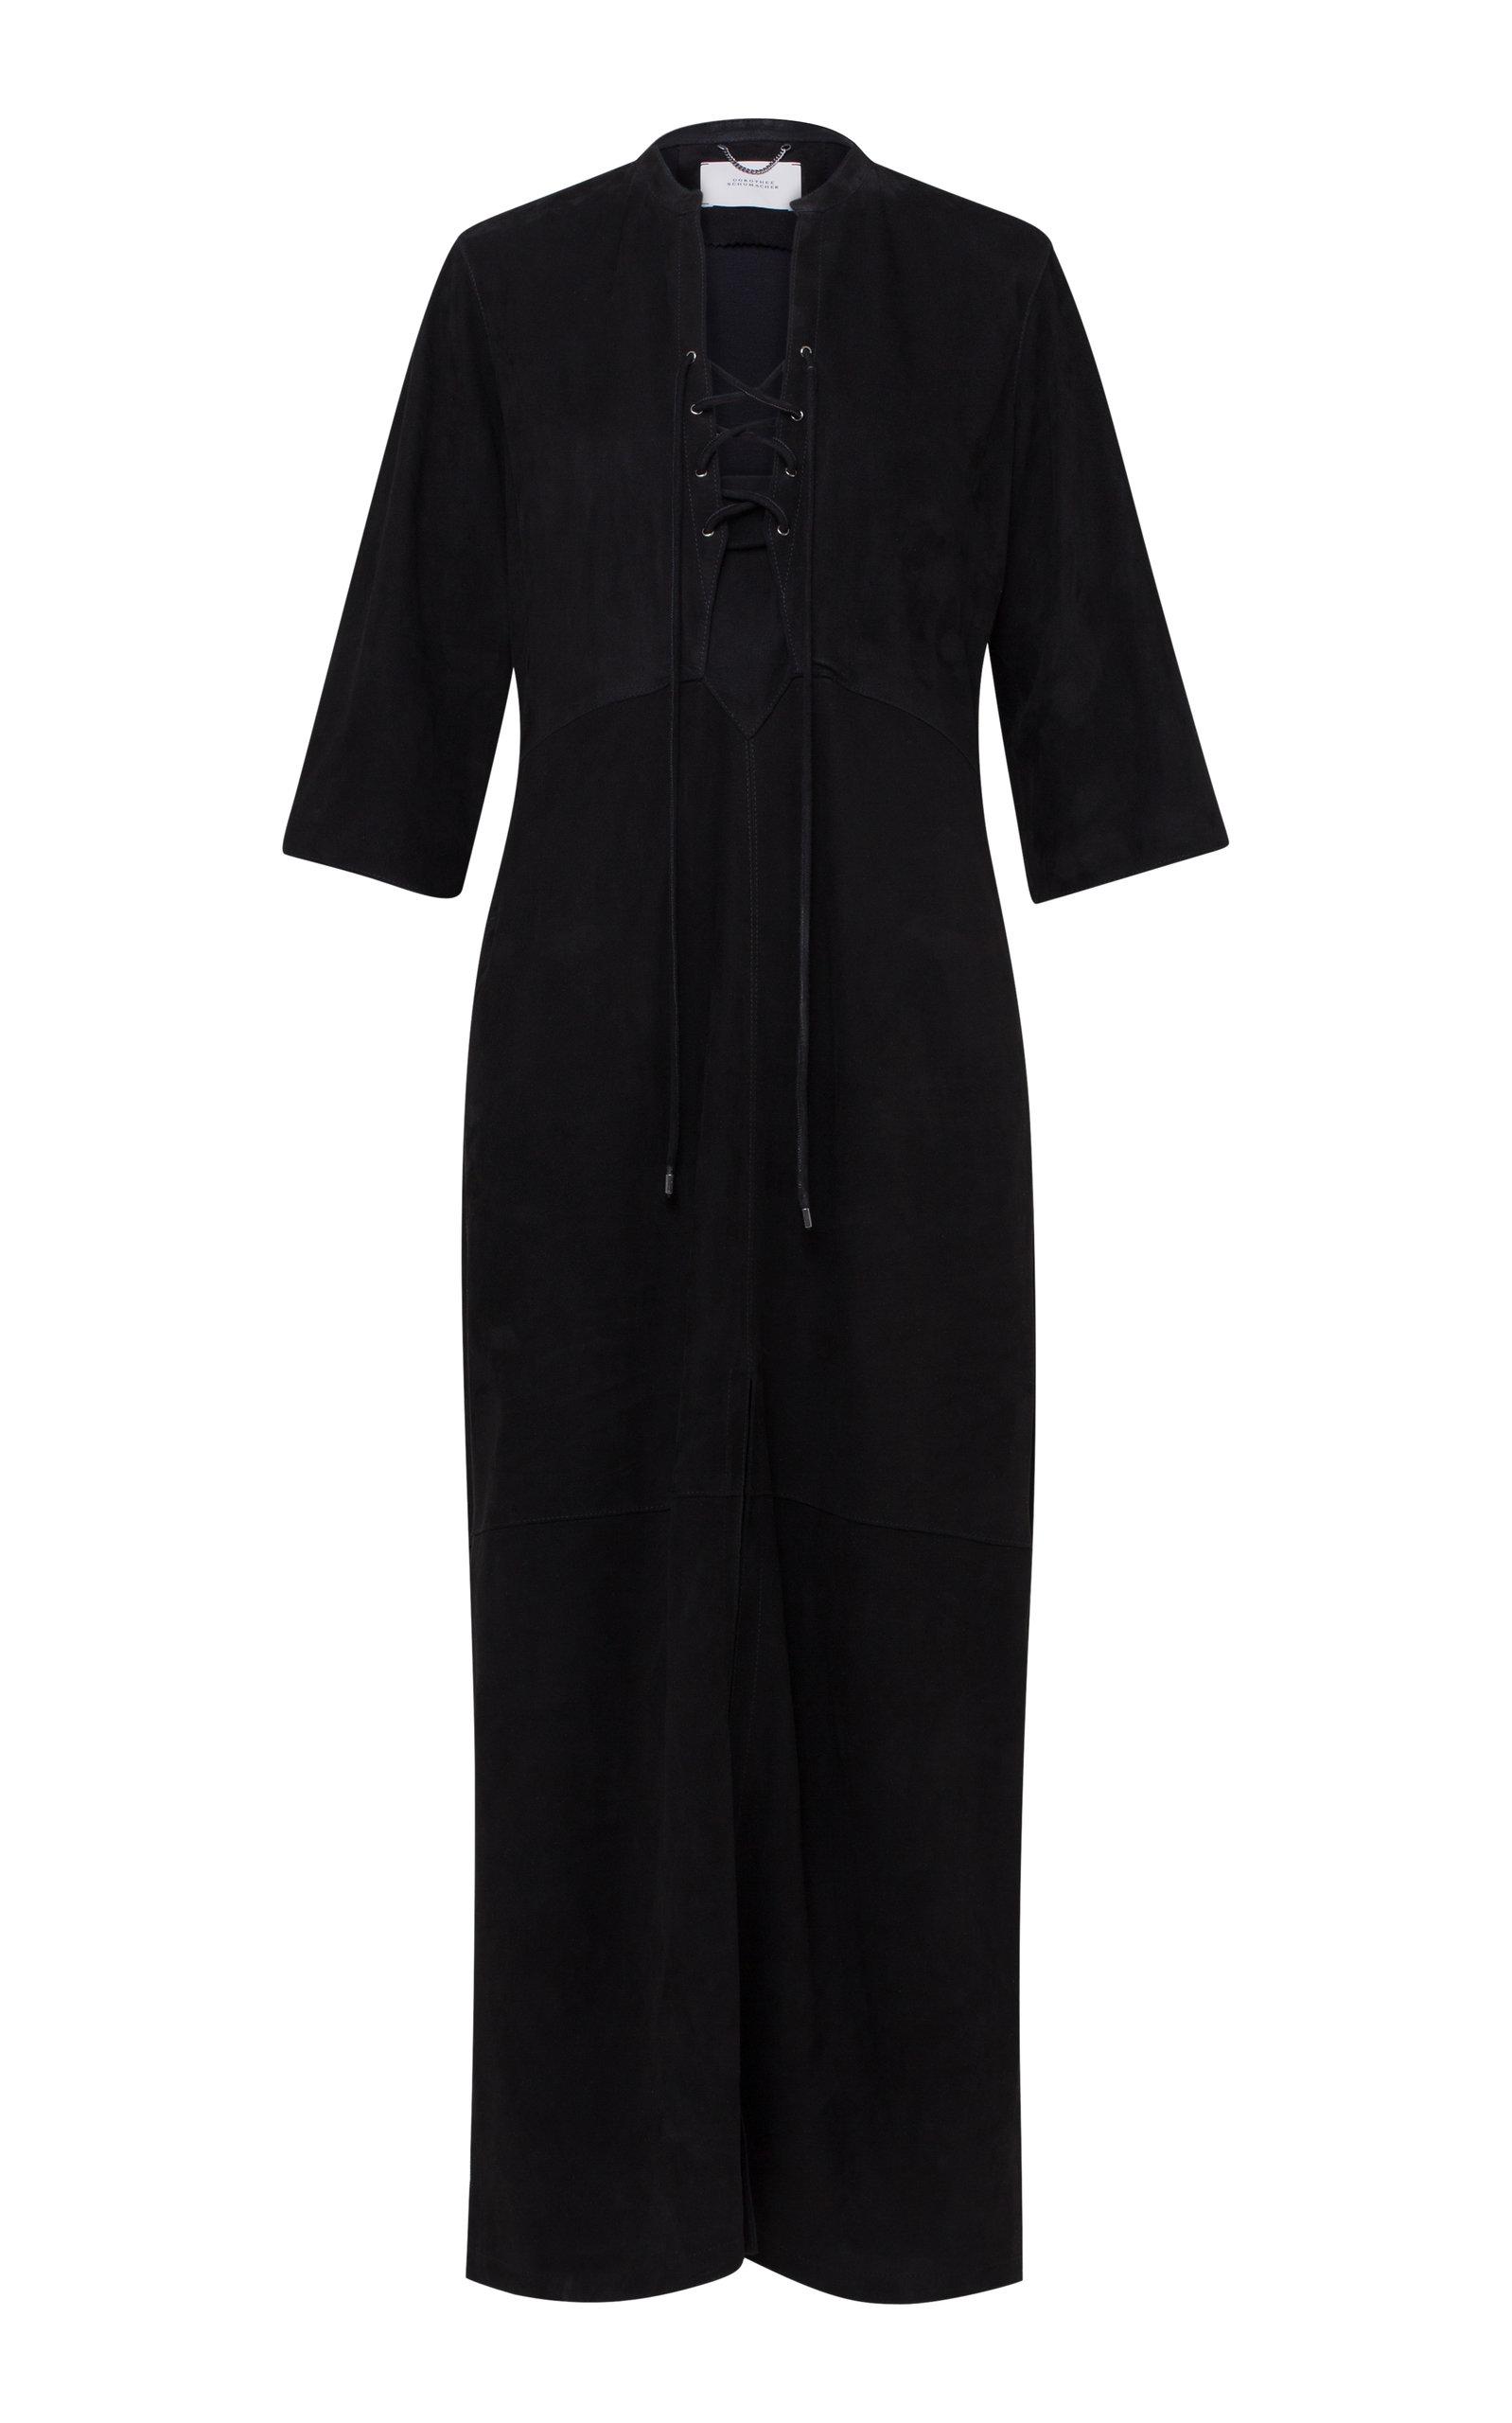 Buy Dorothee Schumacher Velour Softness Leather Midi Dress online, shop Dorothee Schumacher at the best price